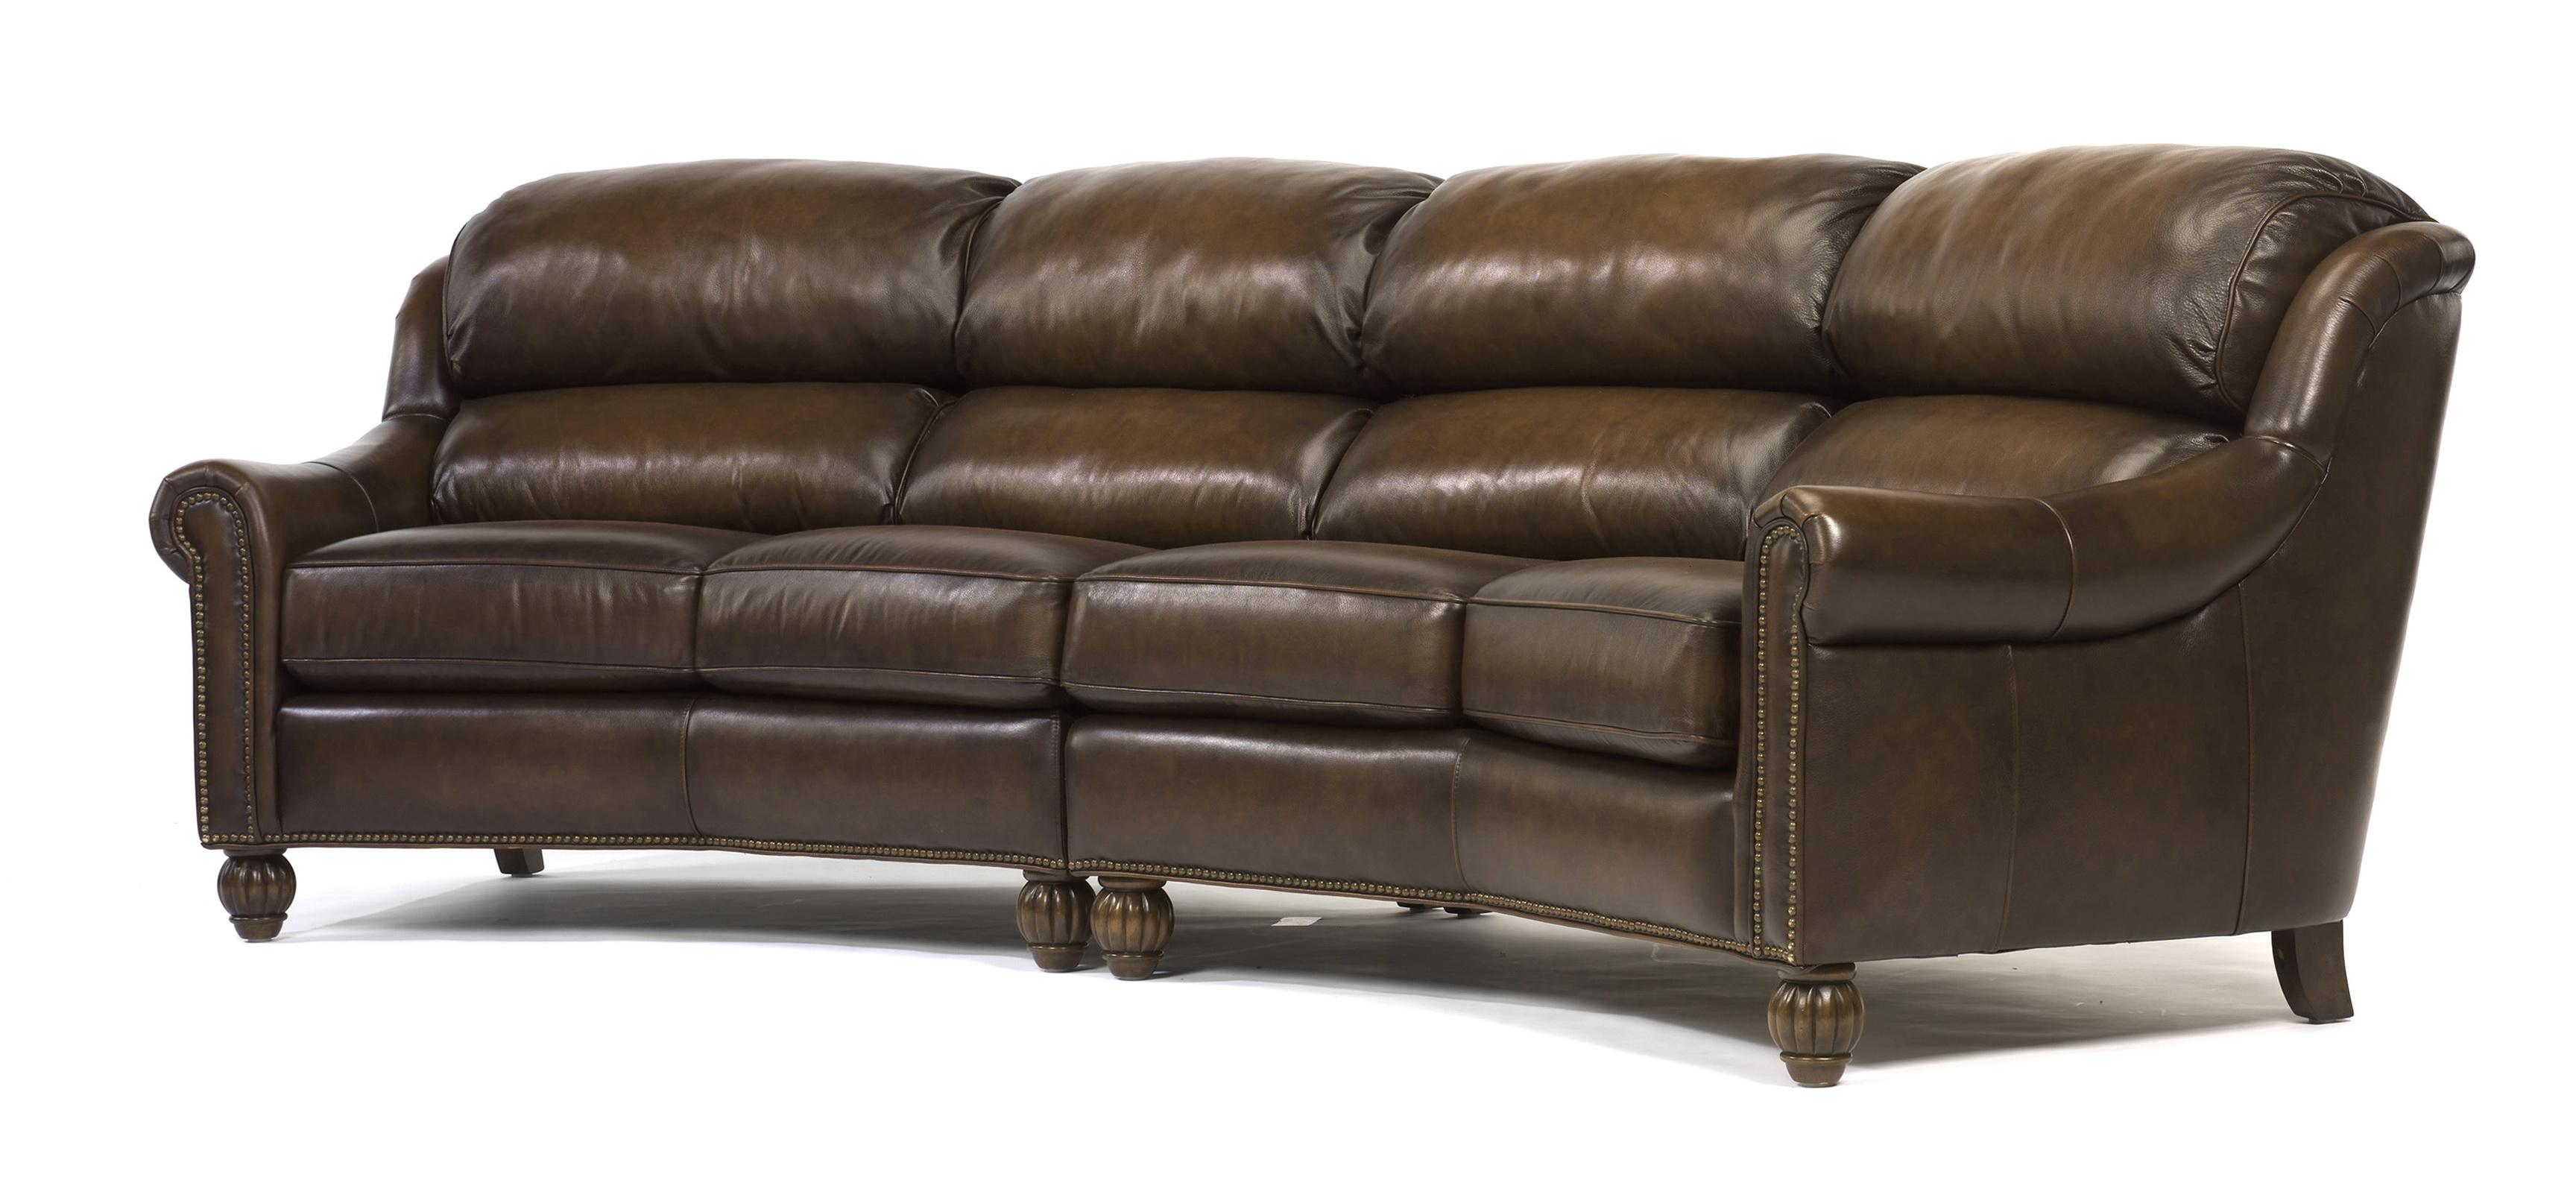 Flexsteel Leather Sofa Reviews